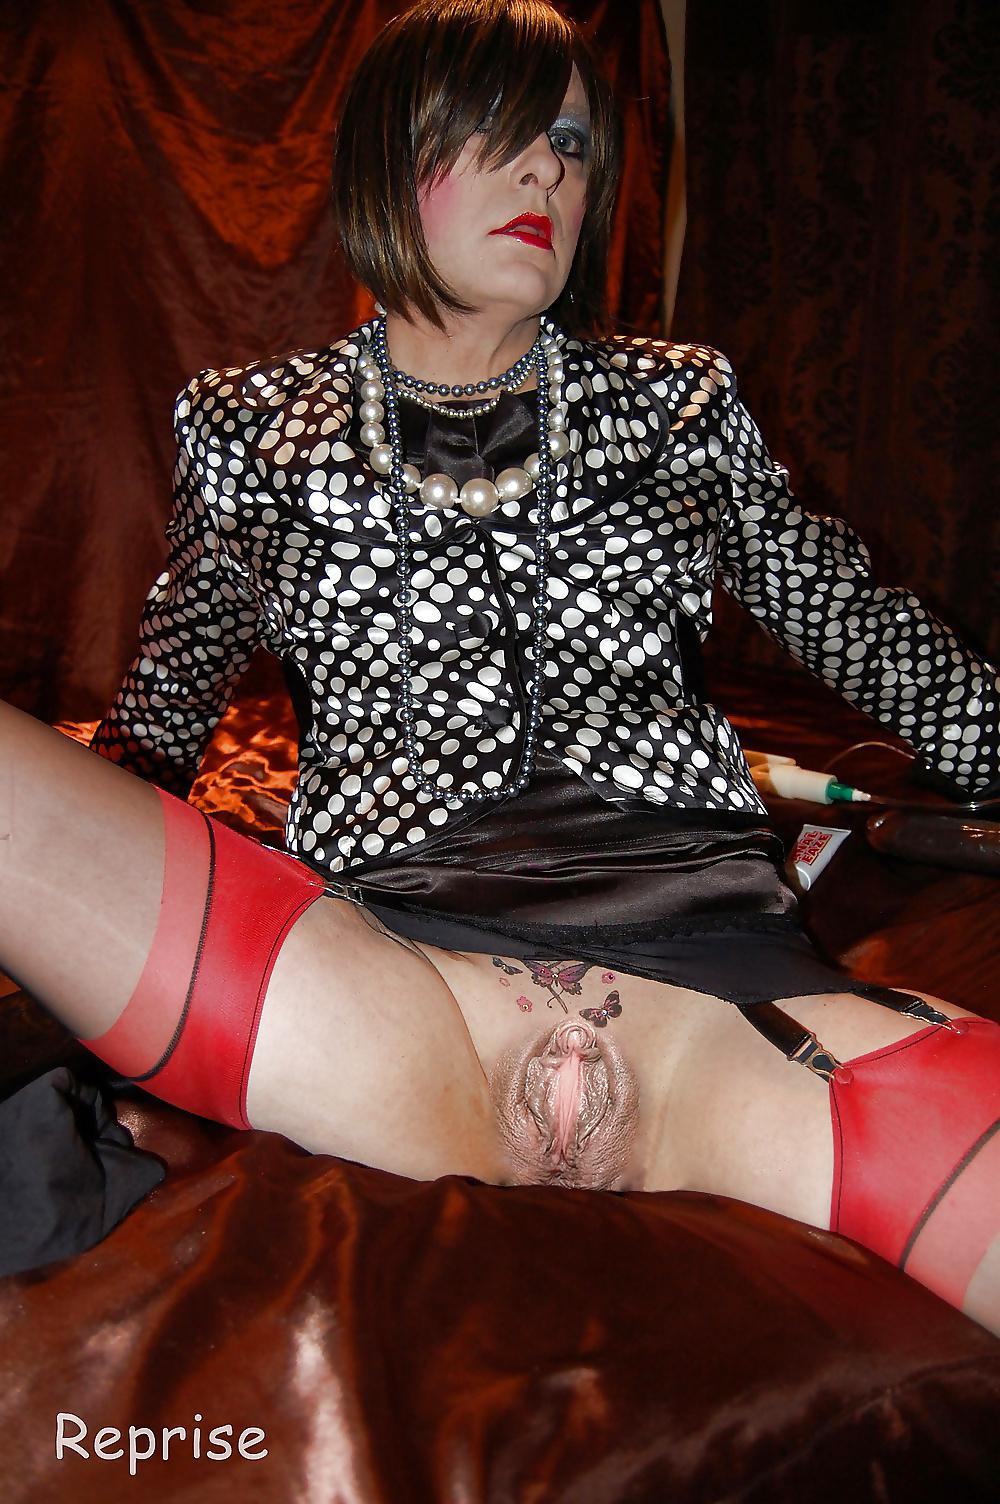 Soft Cotoon Fake Panty Silicone Underwear Thong Vagina Vagina Crossdresser Tg Dg